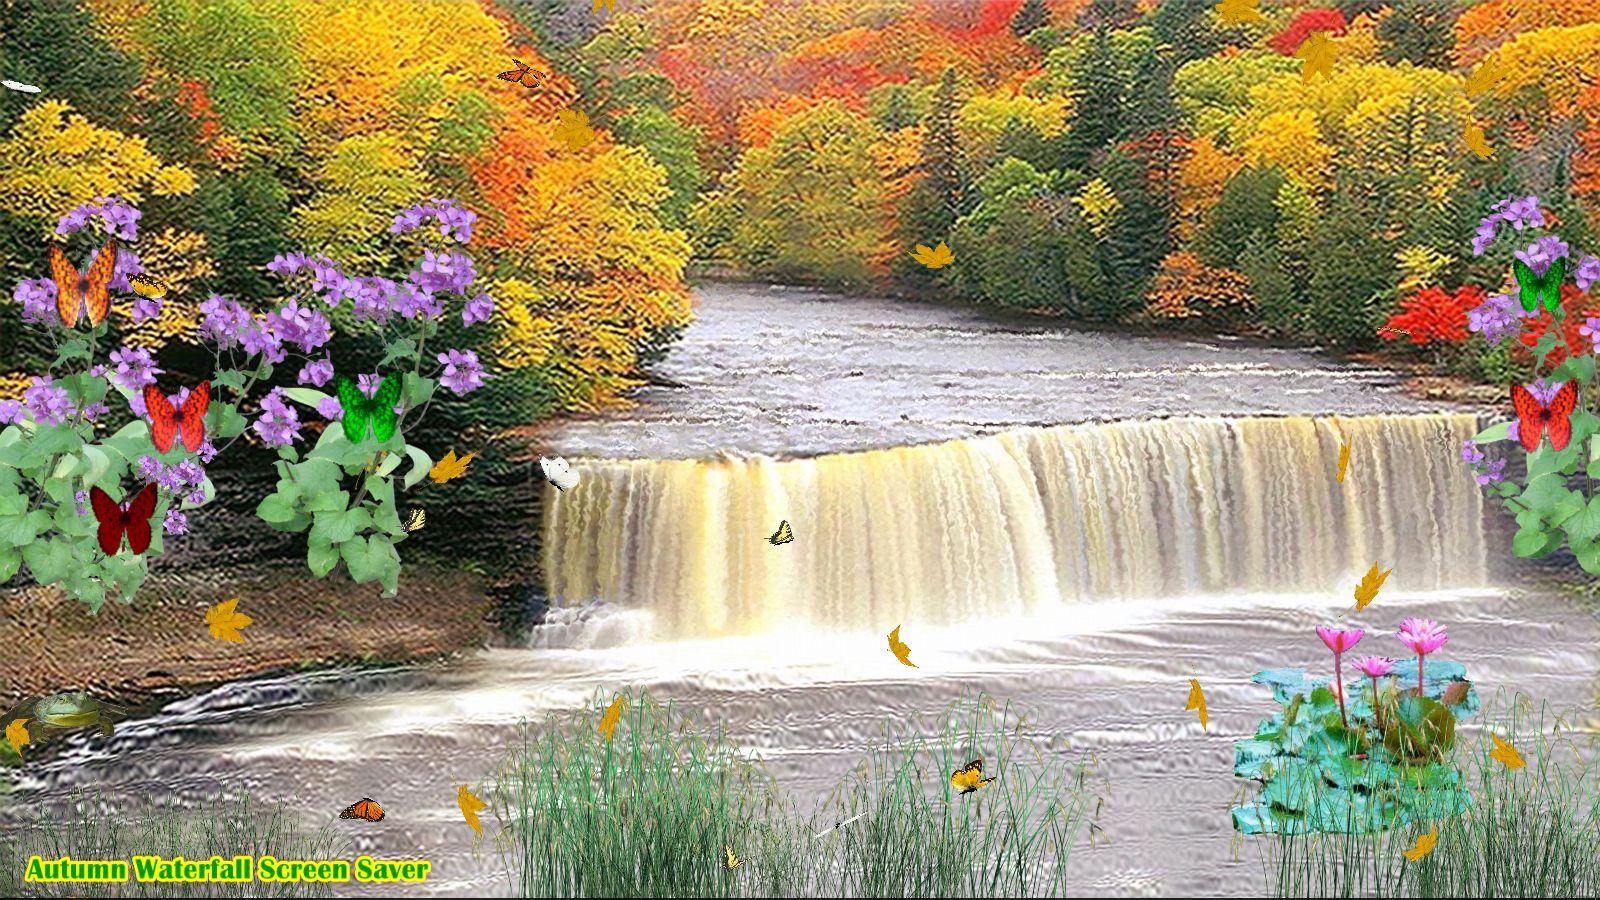 Autumn Waterfall Screen Saver [Download]